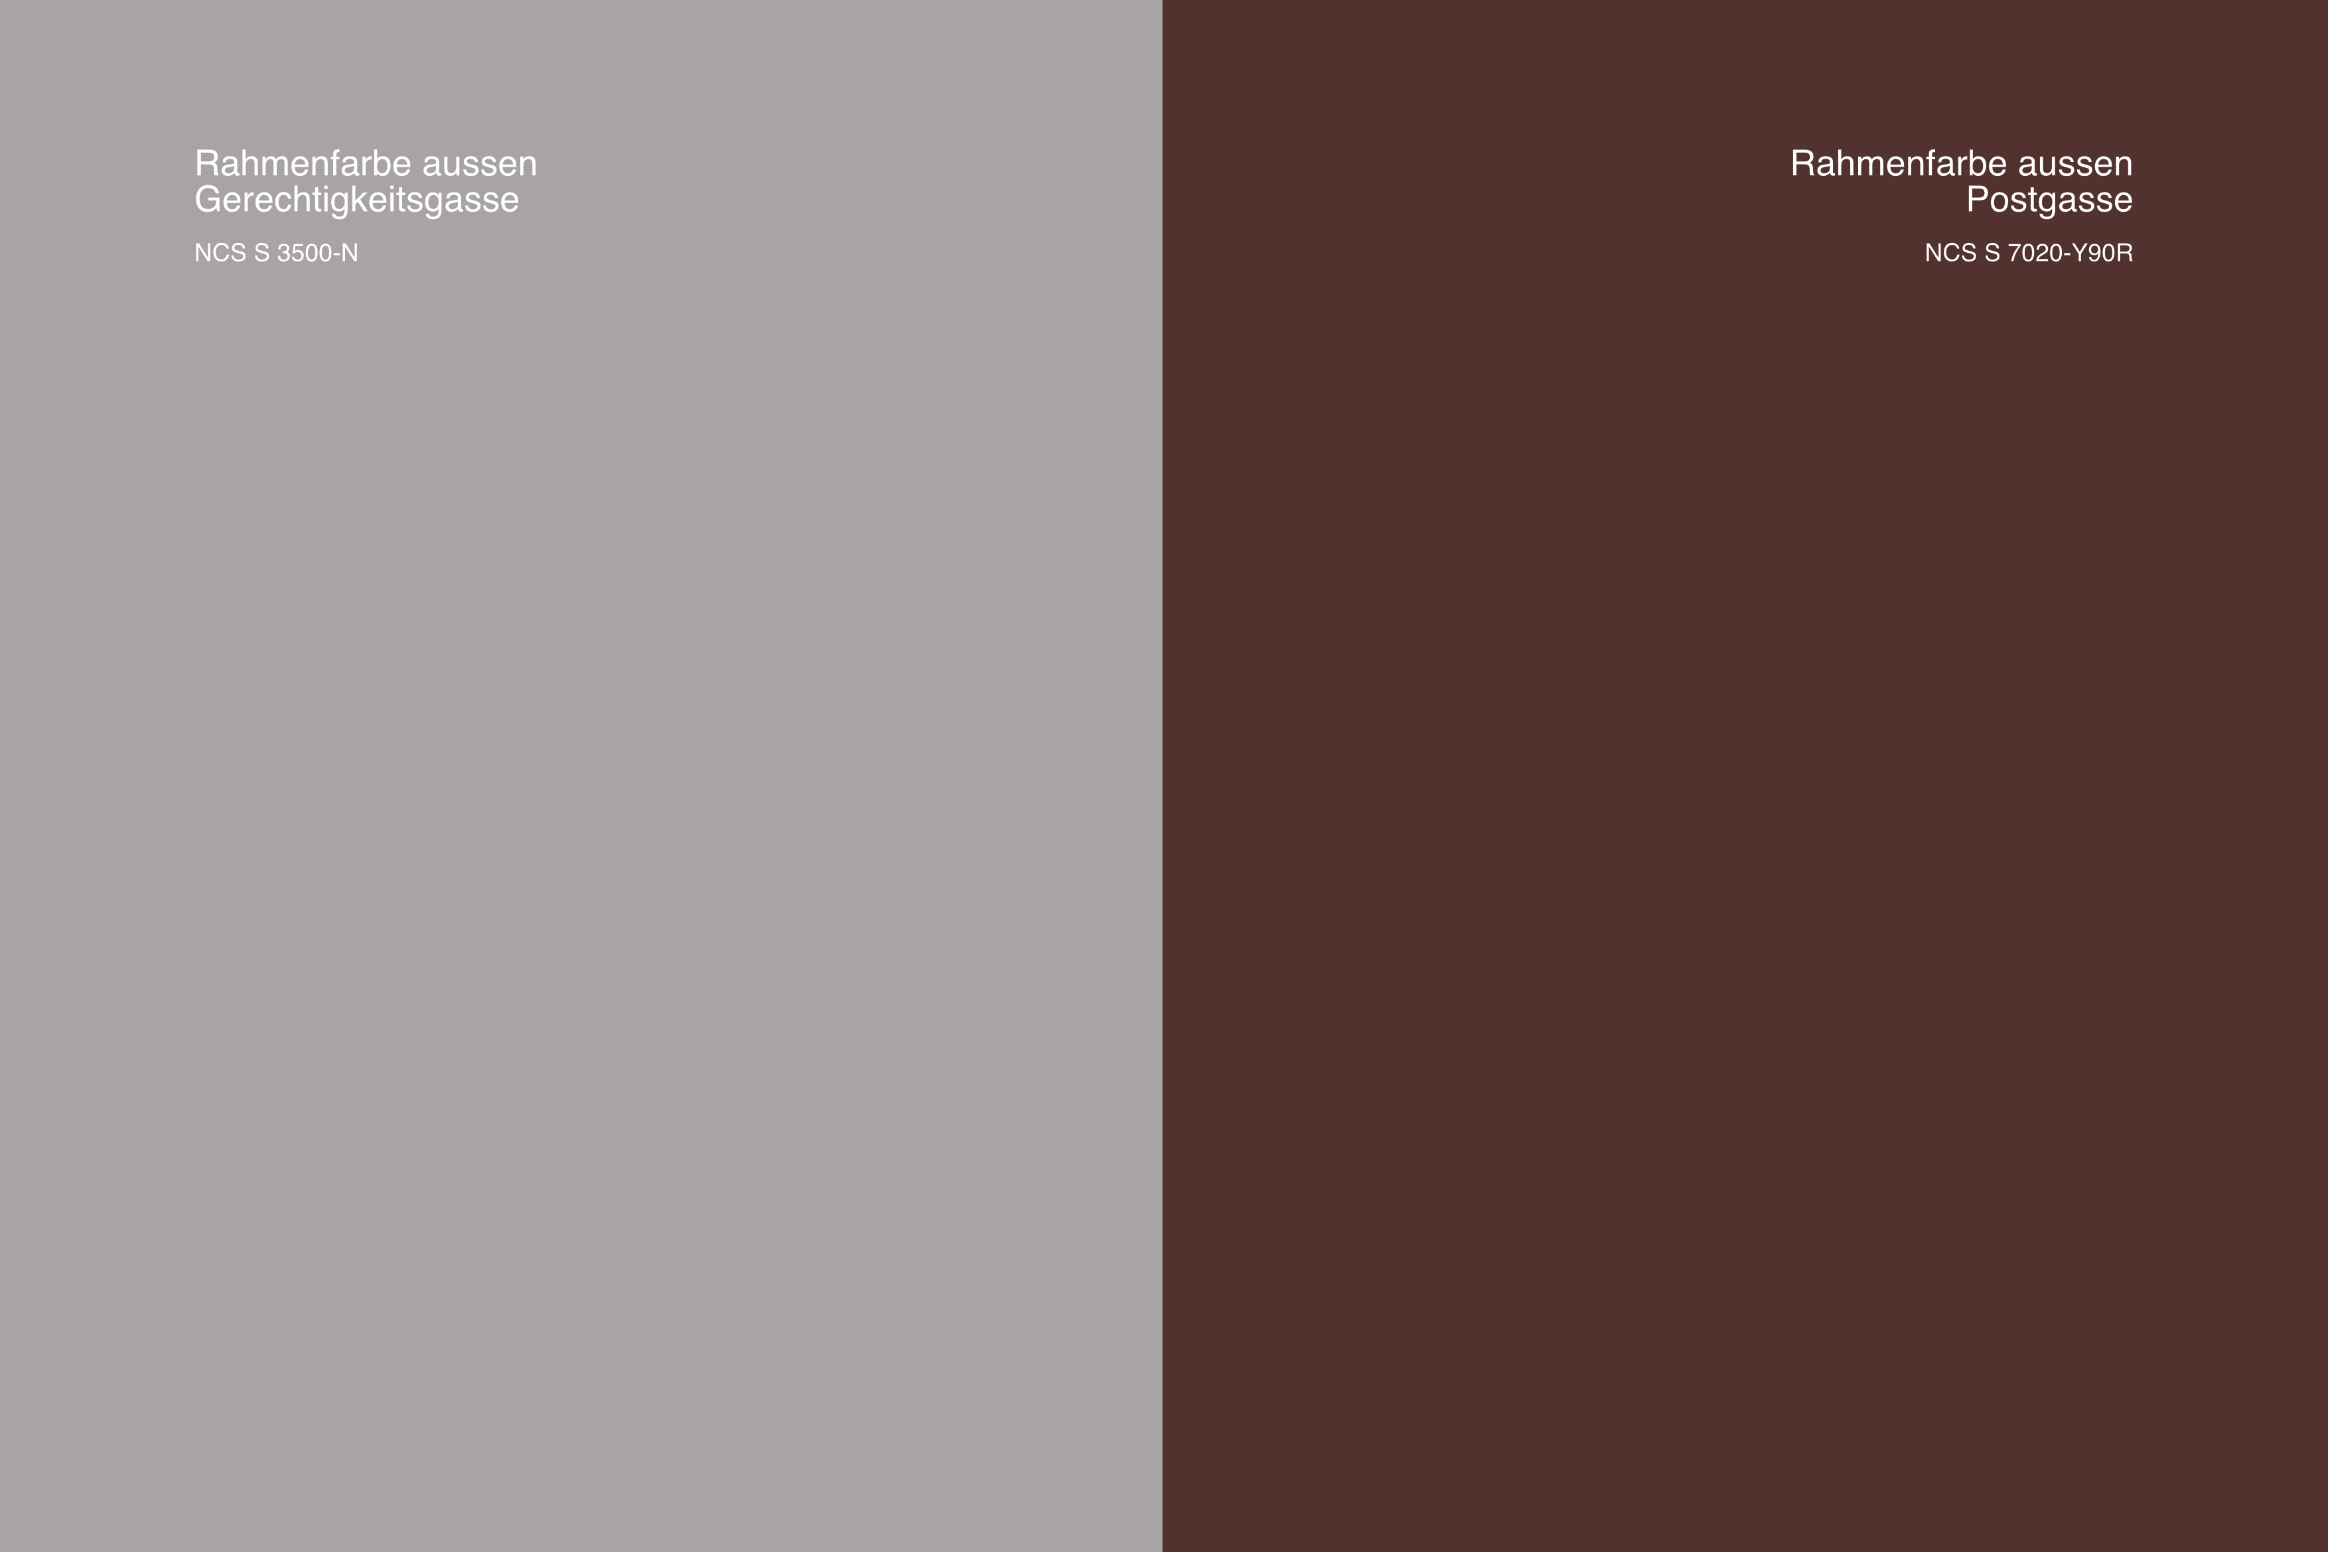 327 5 Rahmenfarben